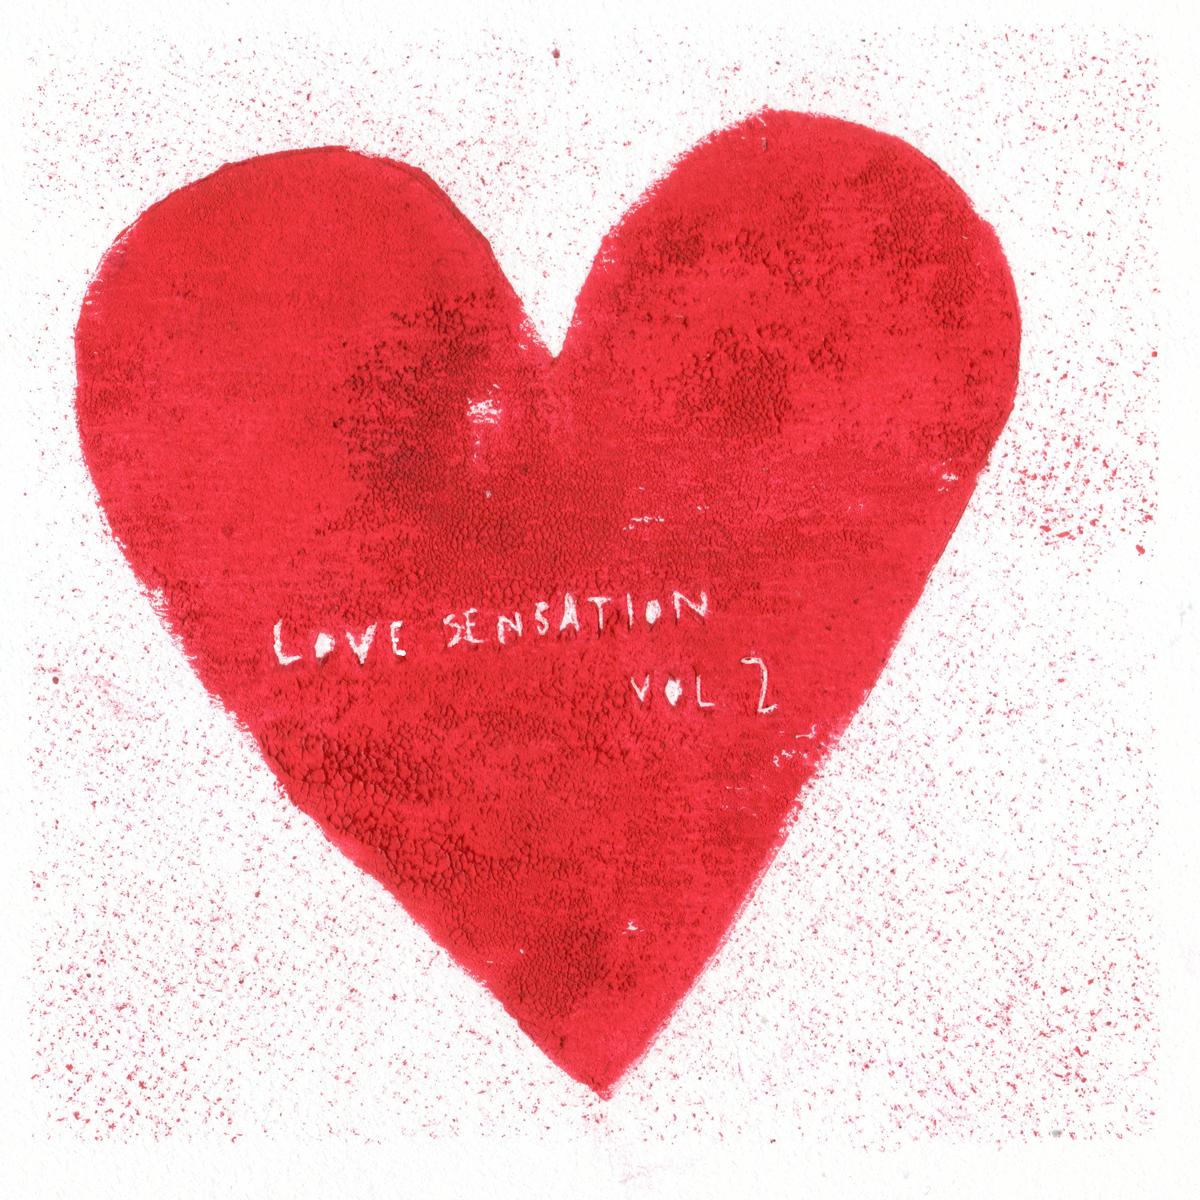 Mix | Love Sensation Vol. 2